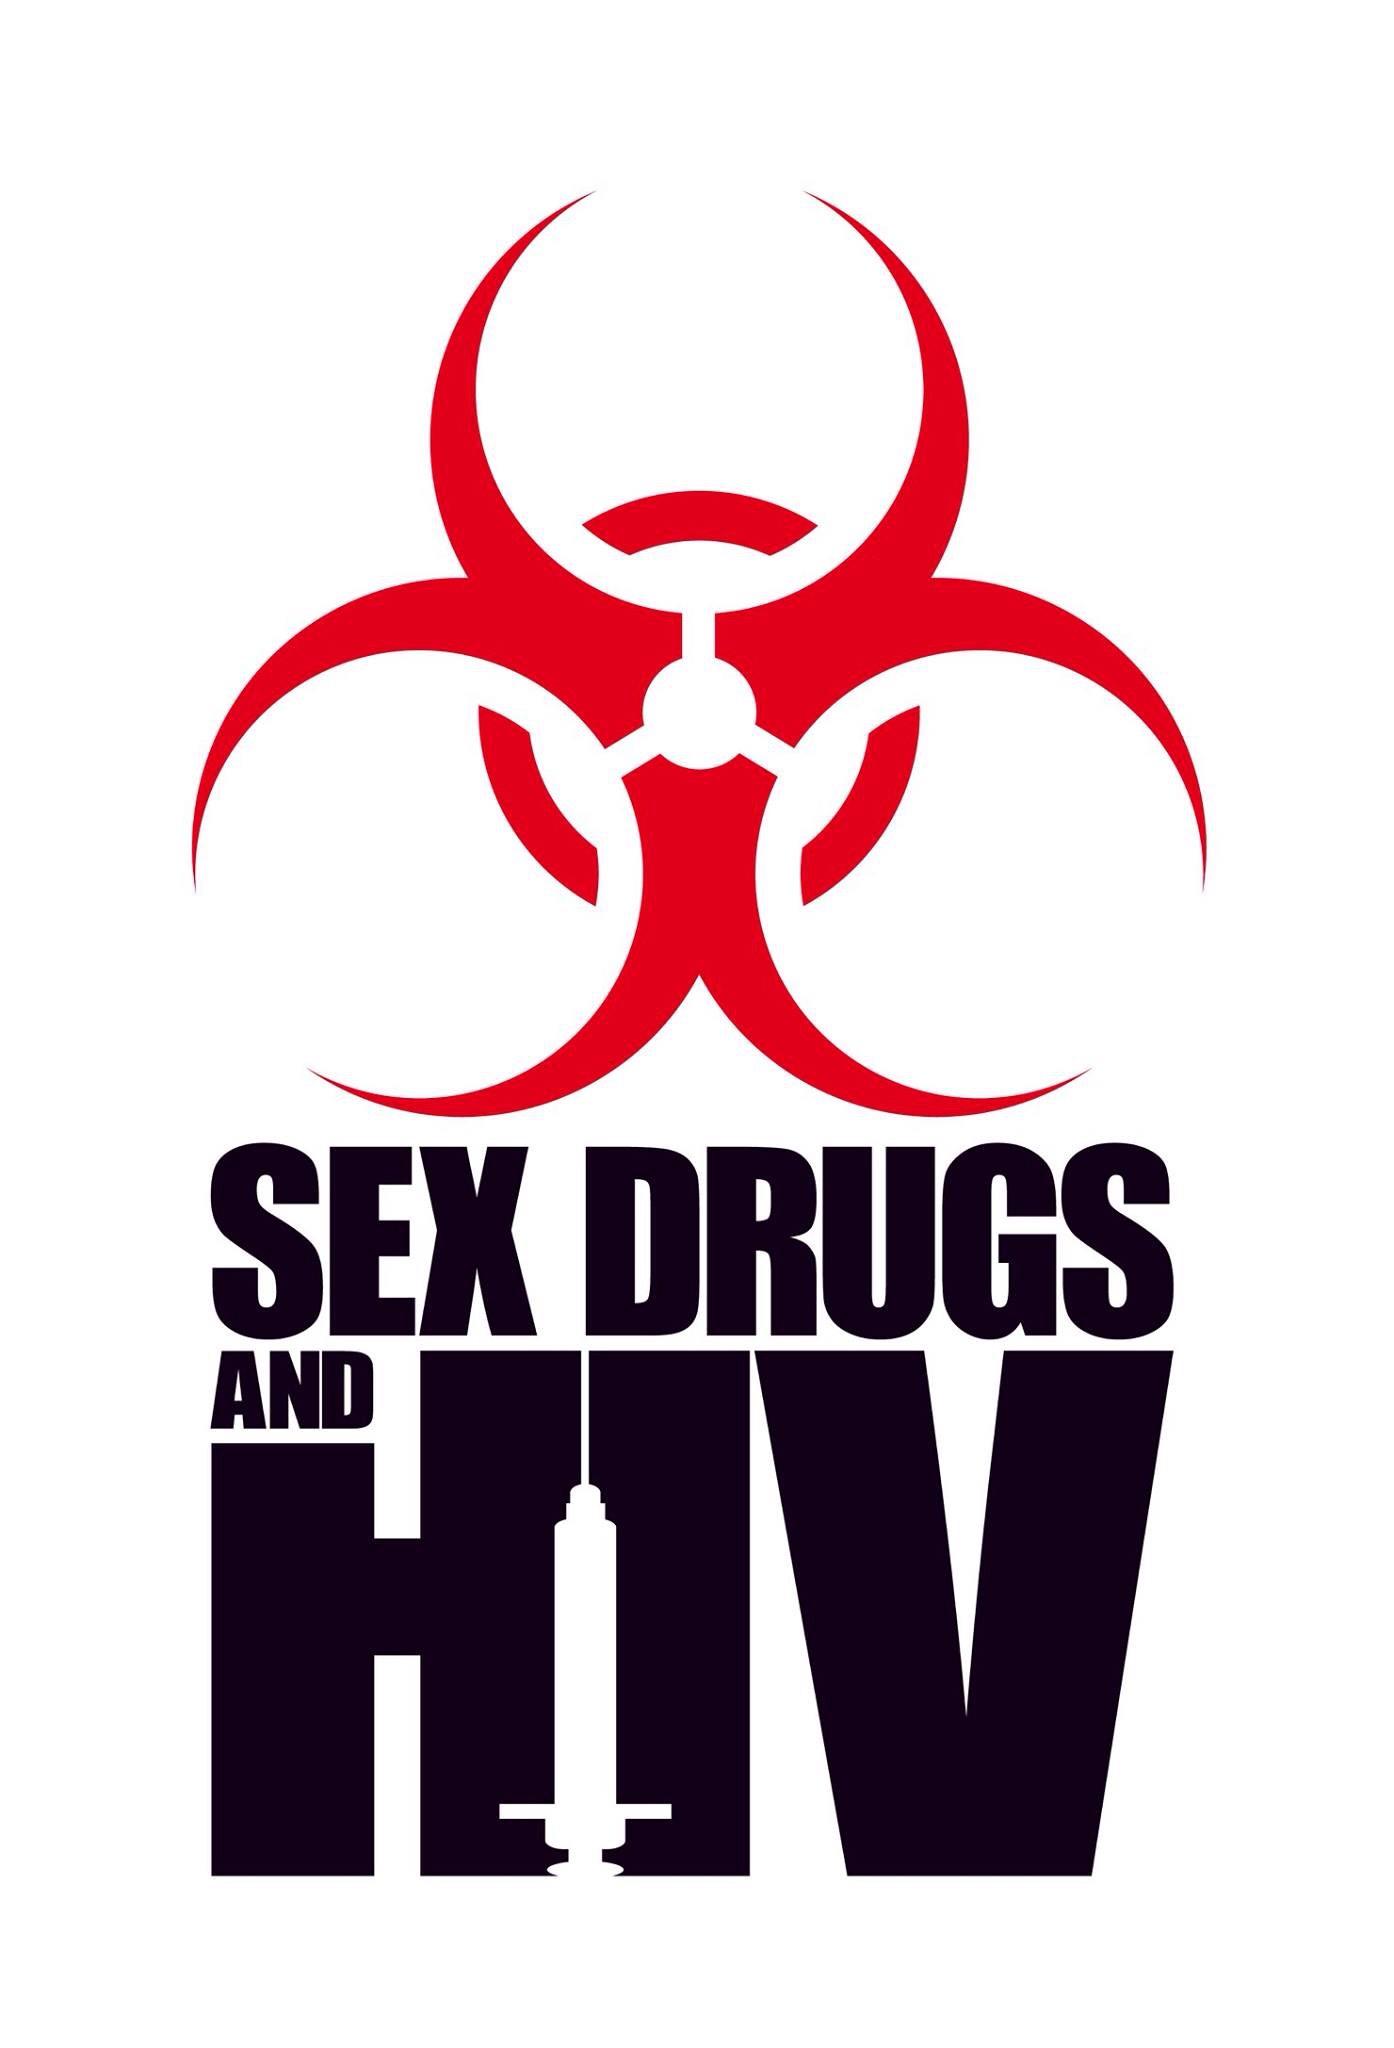 Sex Drugs and HIV album cover artwork